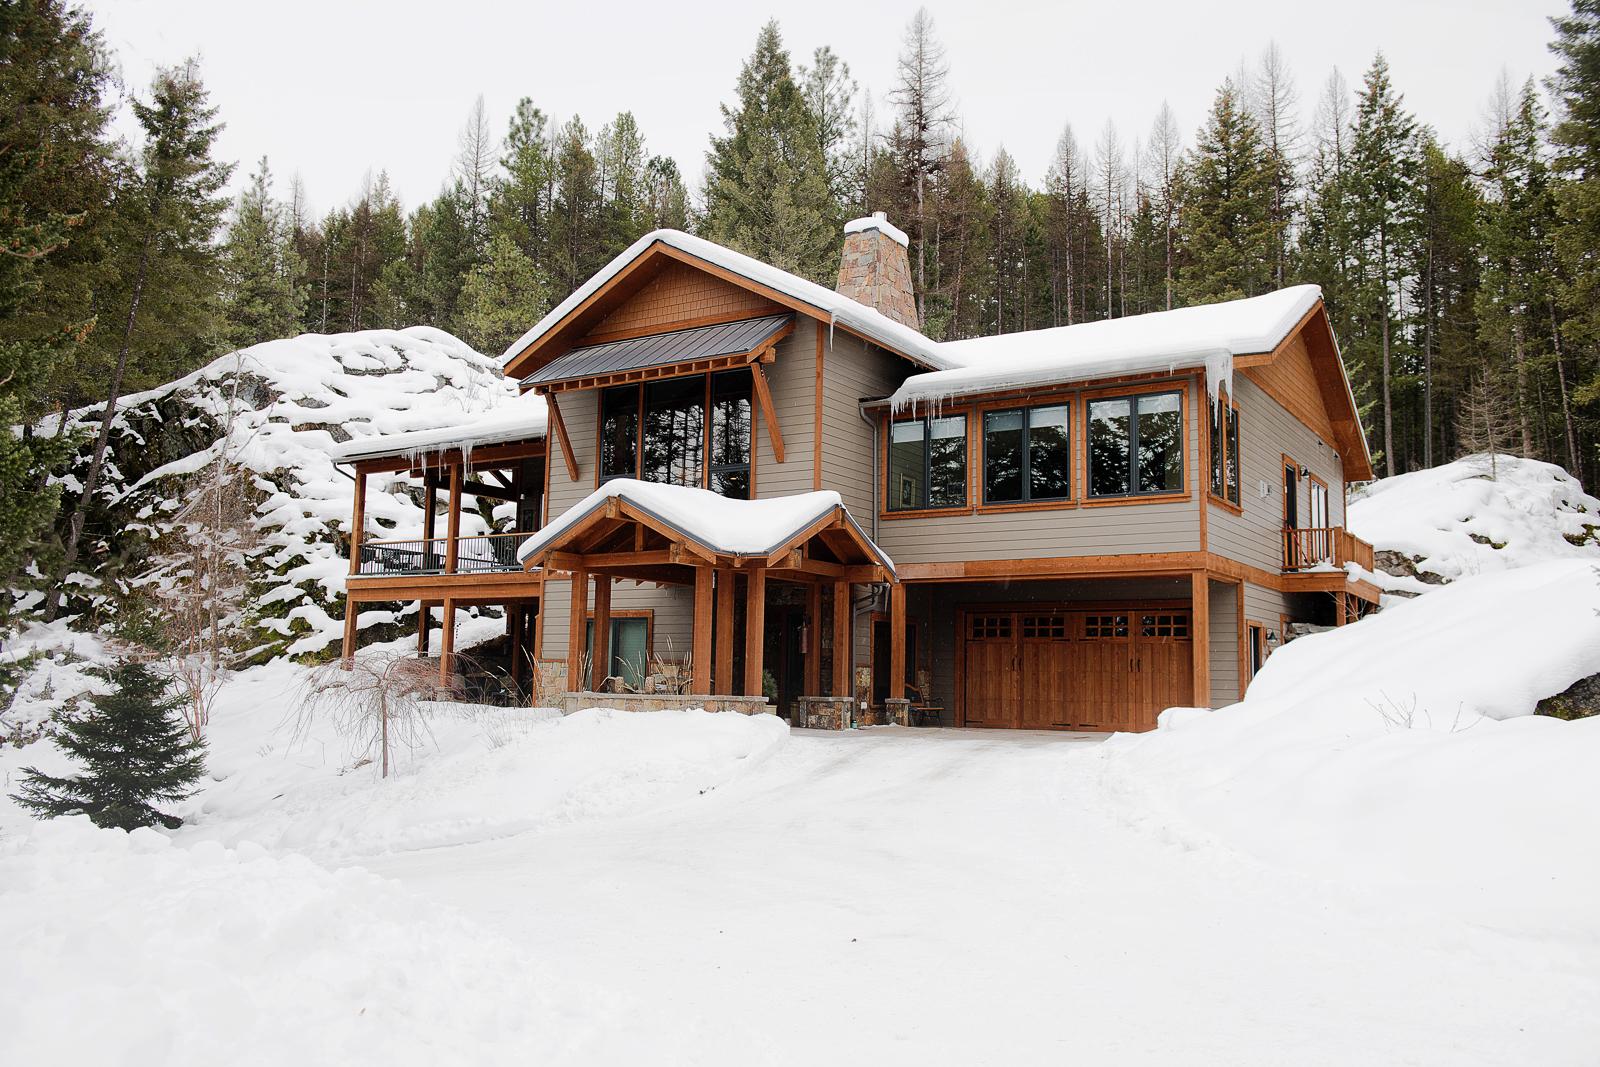 Woodworks-West-Bozeman-Montana-Builder-Cabinetry-Remodel-New-Construction-3700.jpg